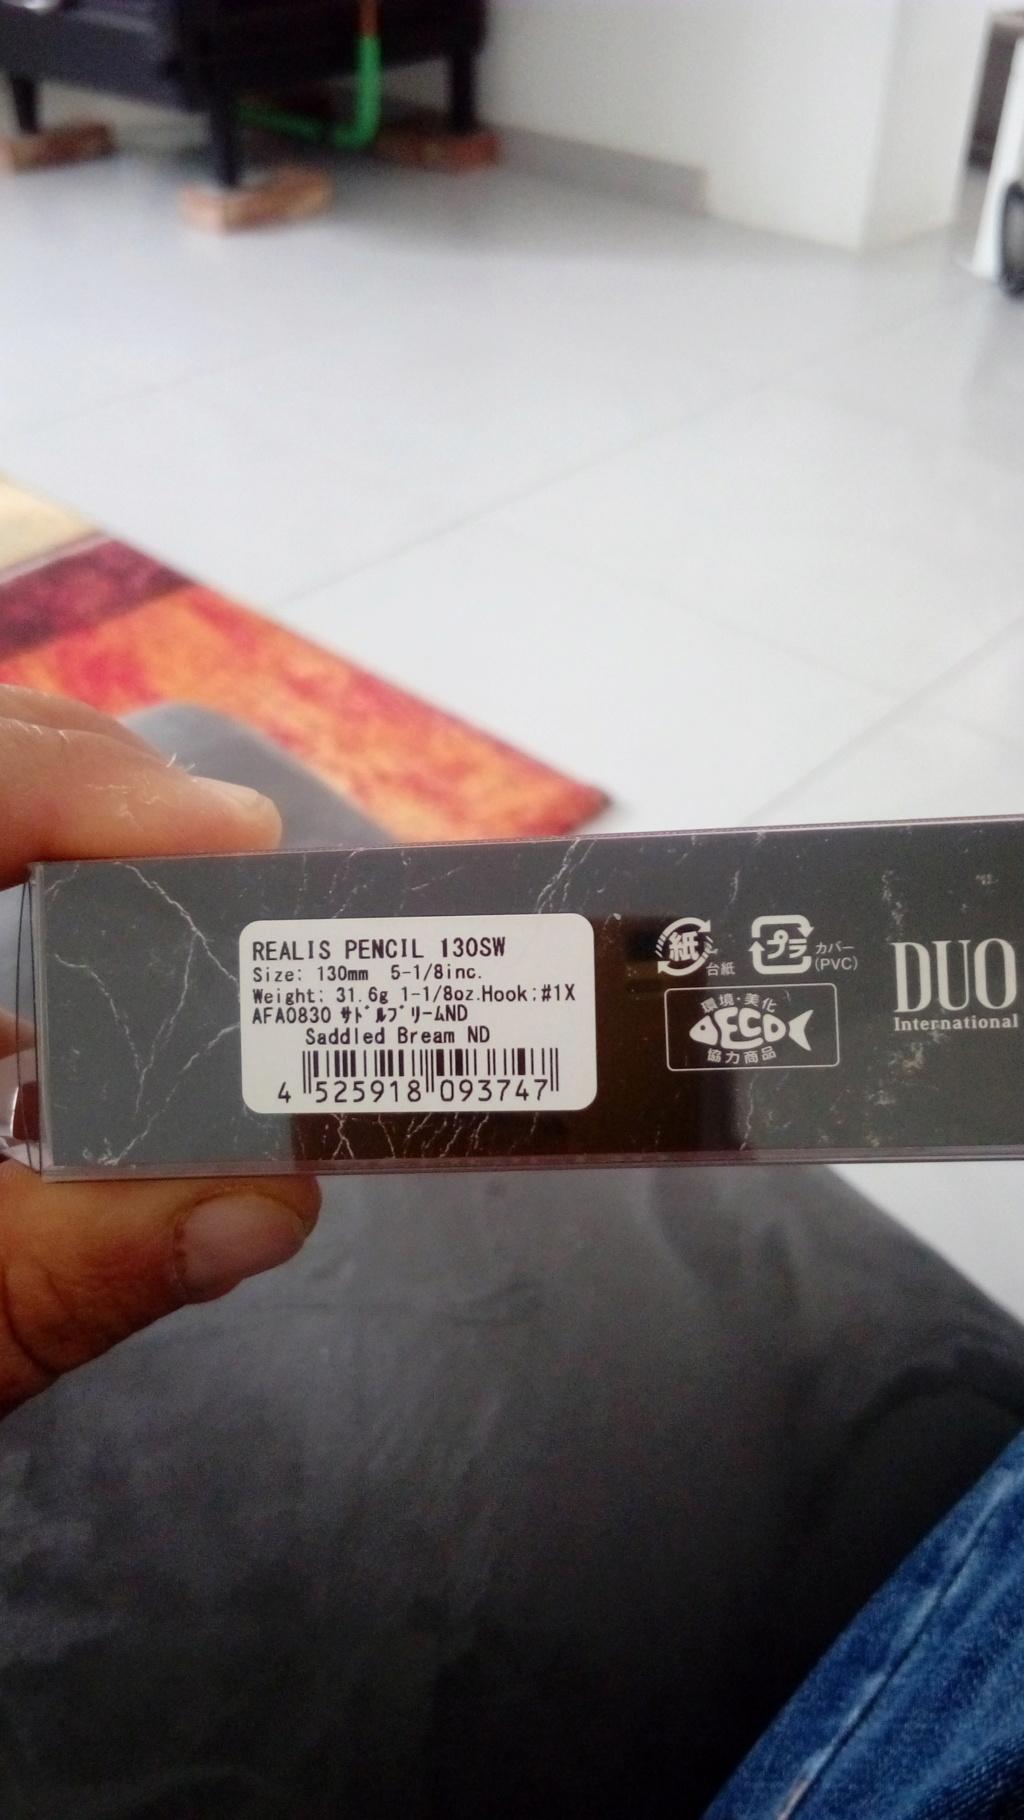 [VENDO][nuovo] duo realis pencil 130 15402910